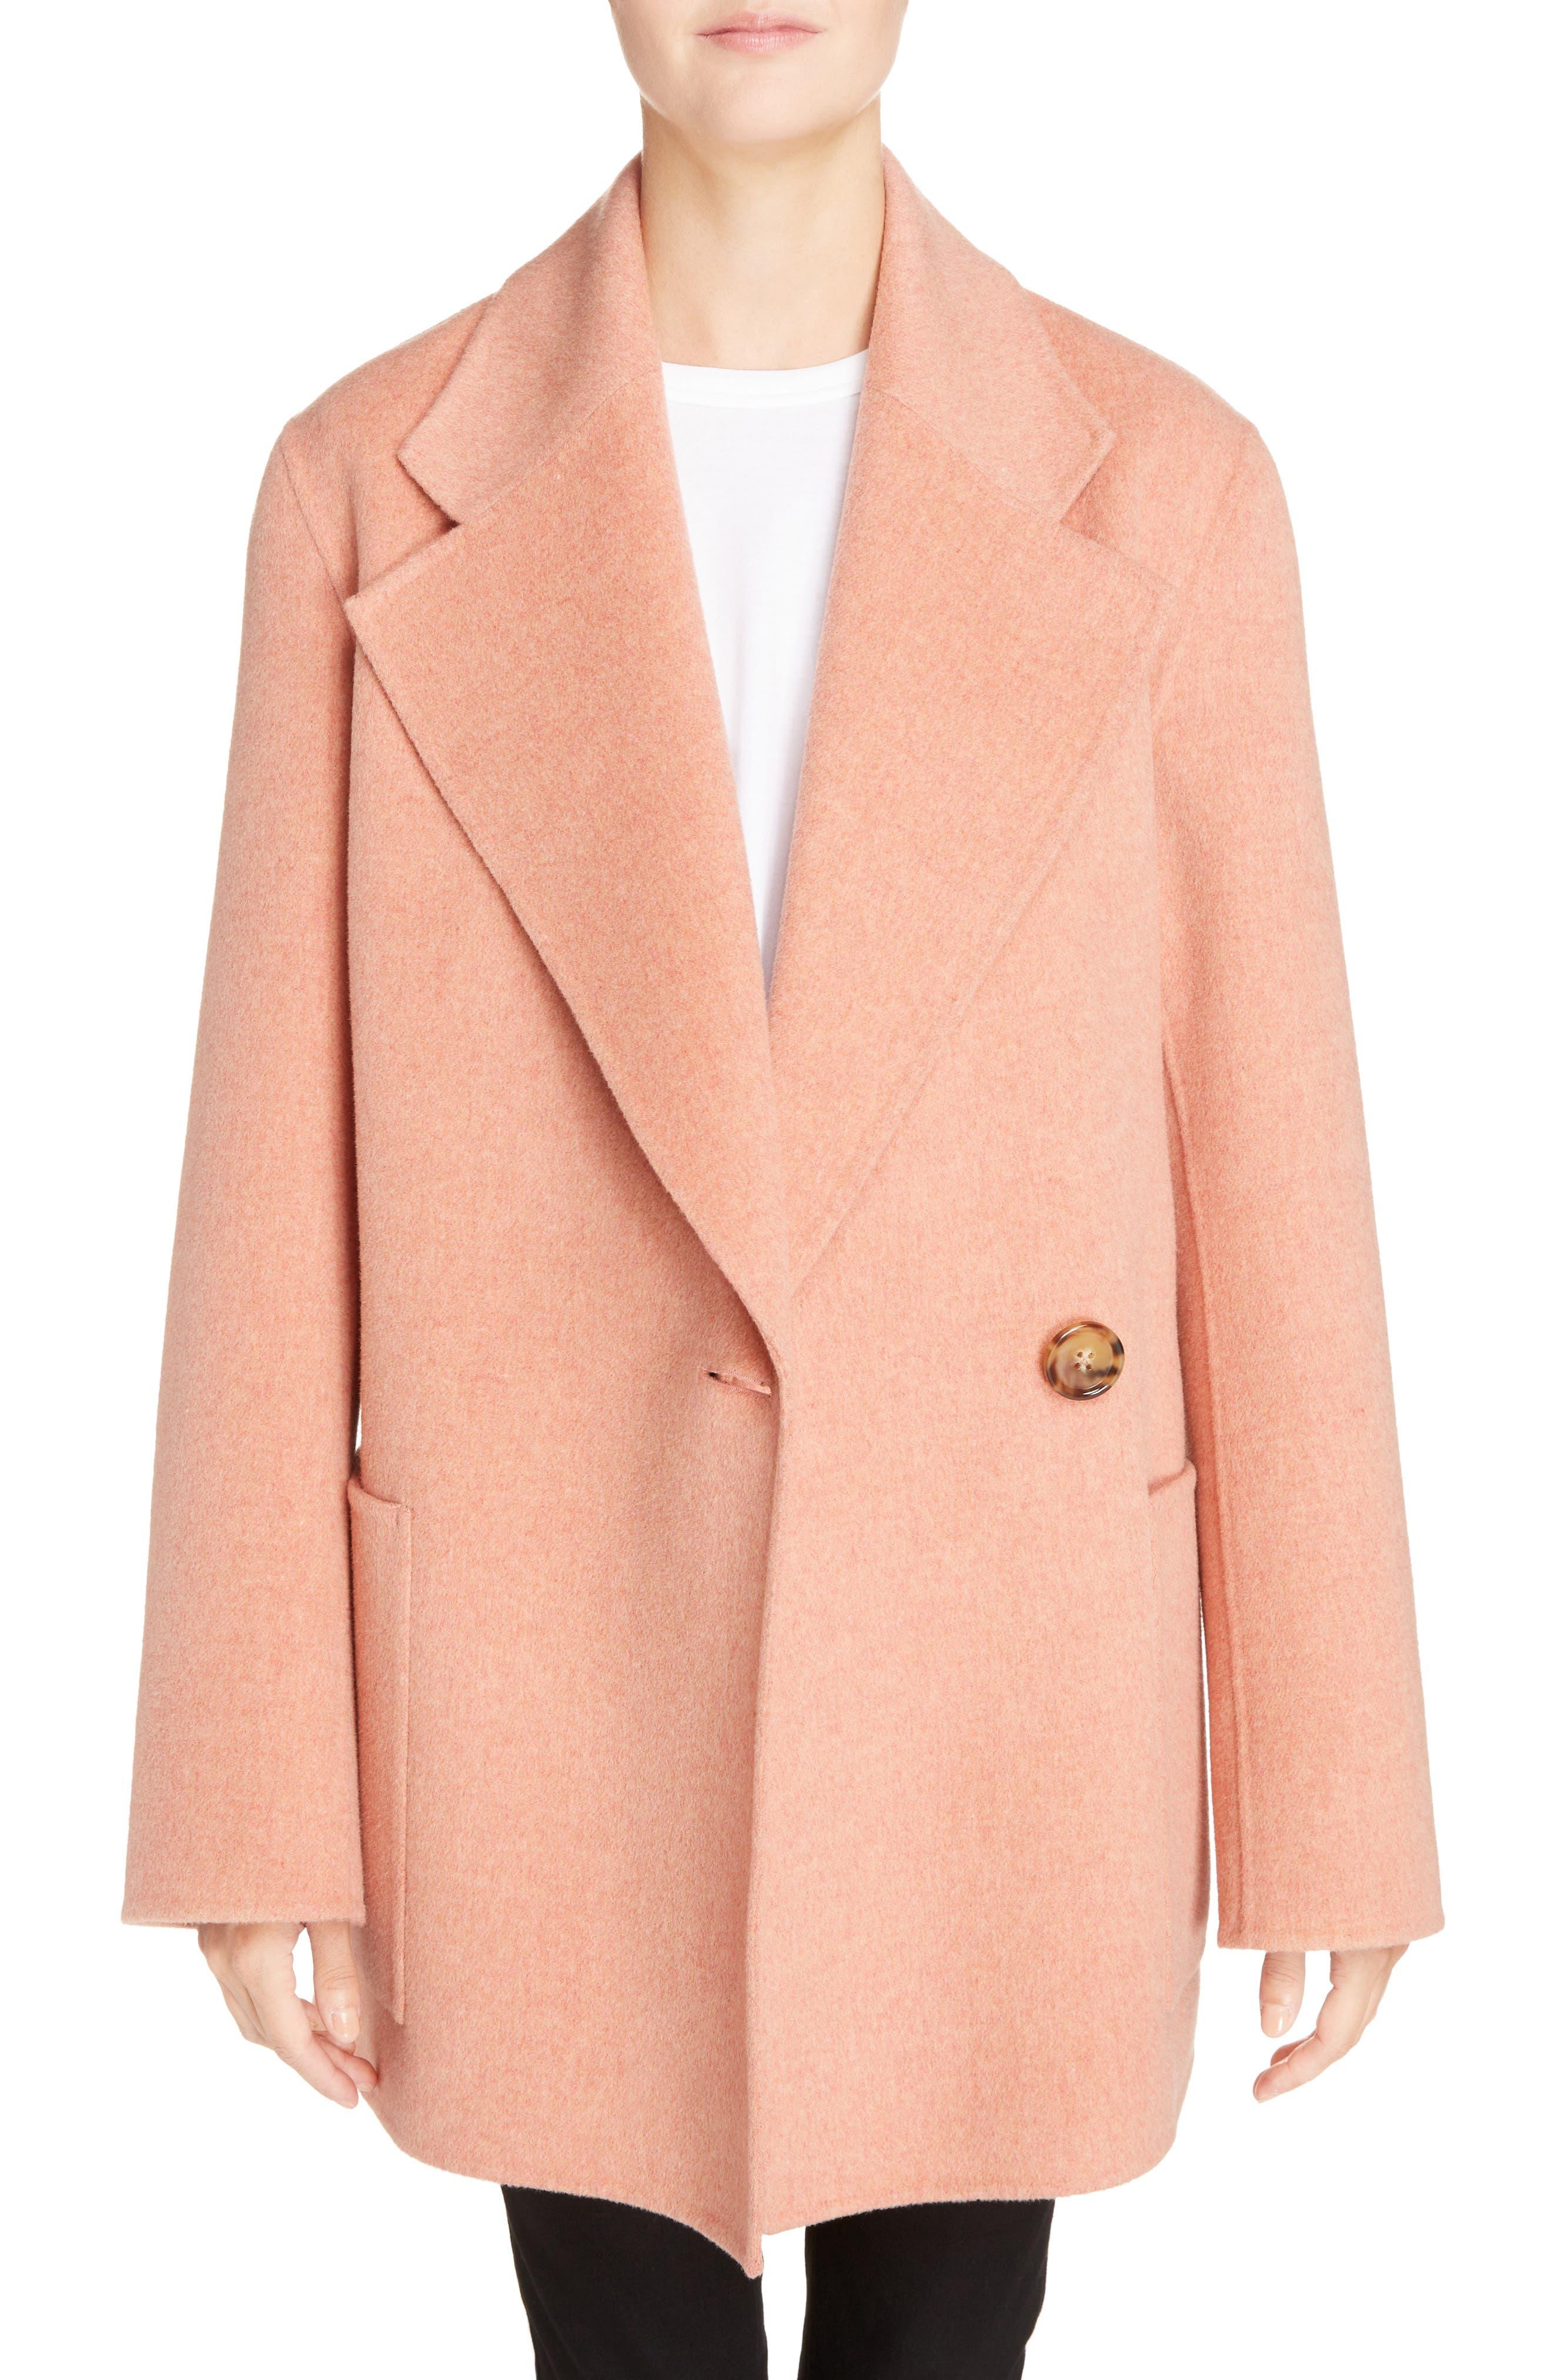 Anika Doublé Wool & Cashmere Coat,                             Main thumbnail 1, color,                             650